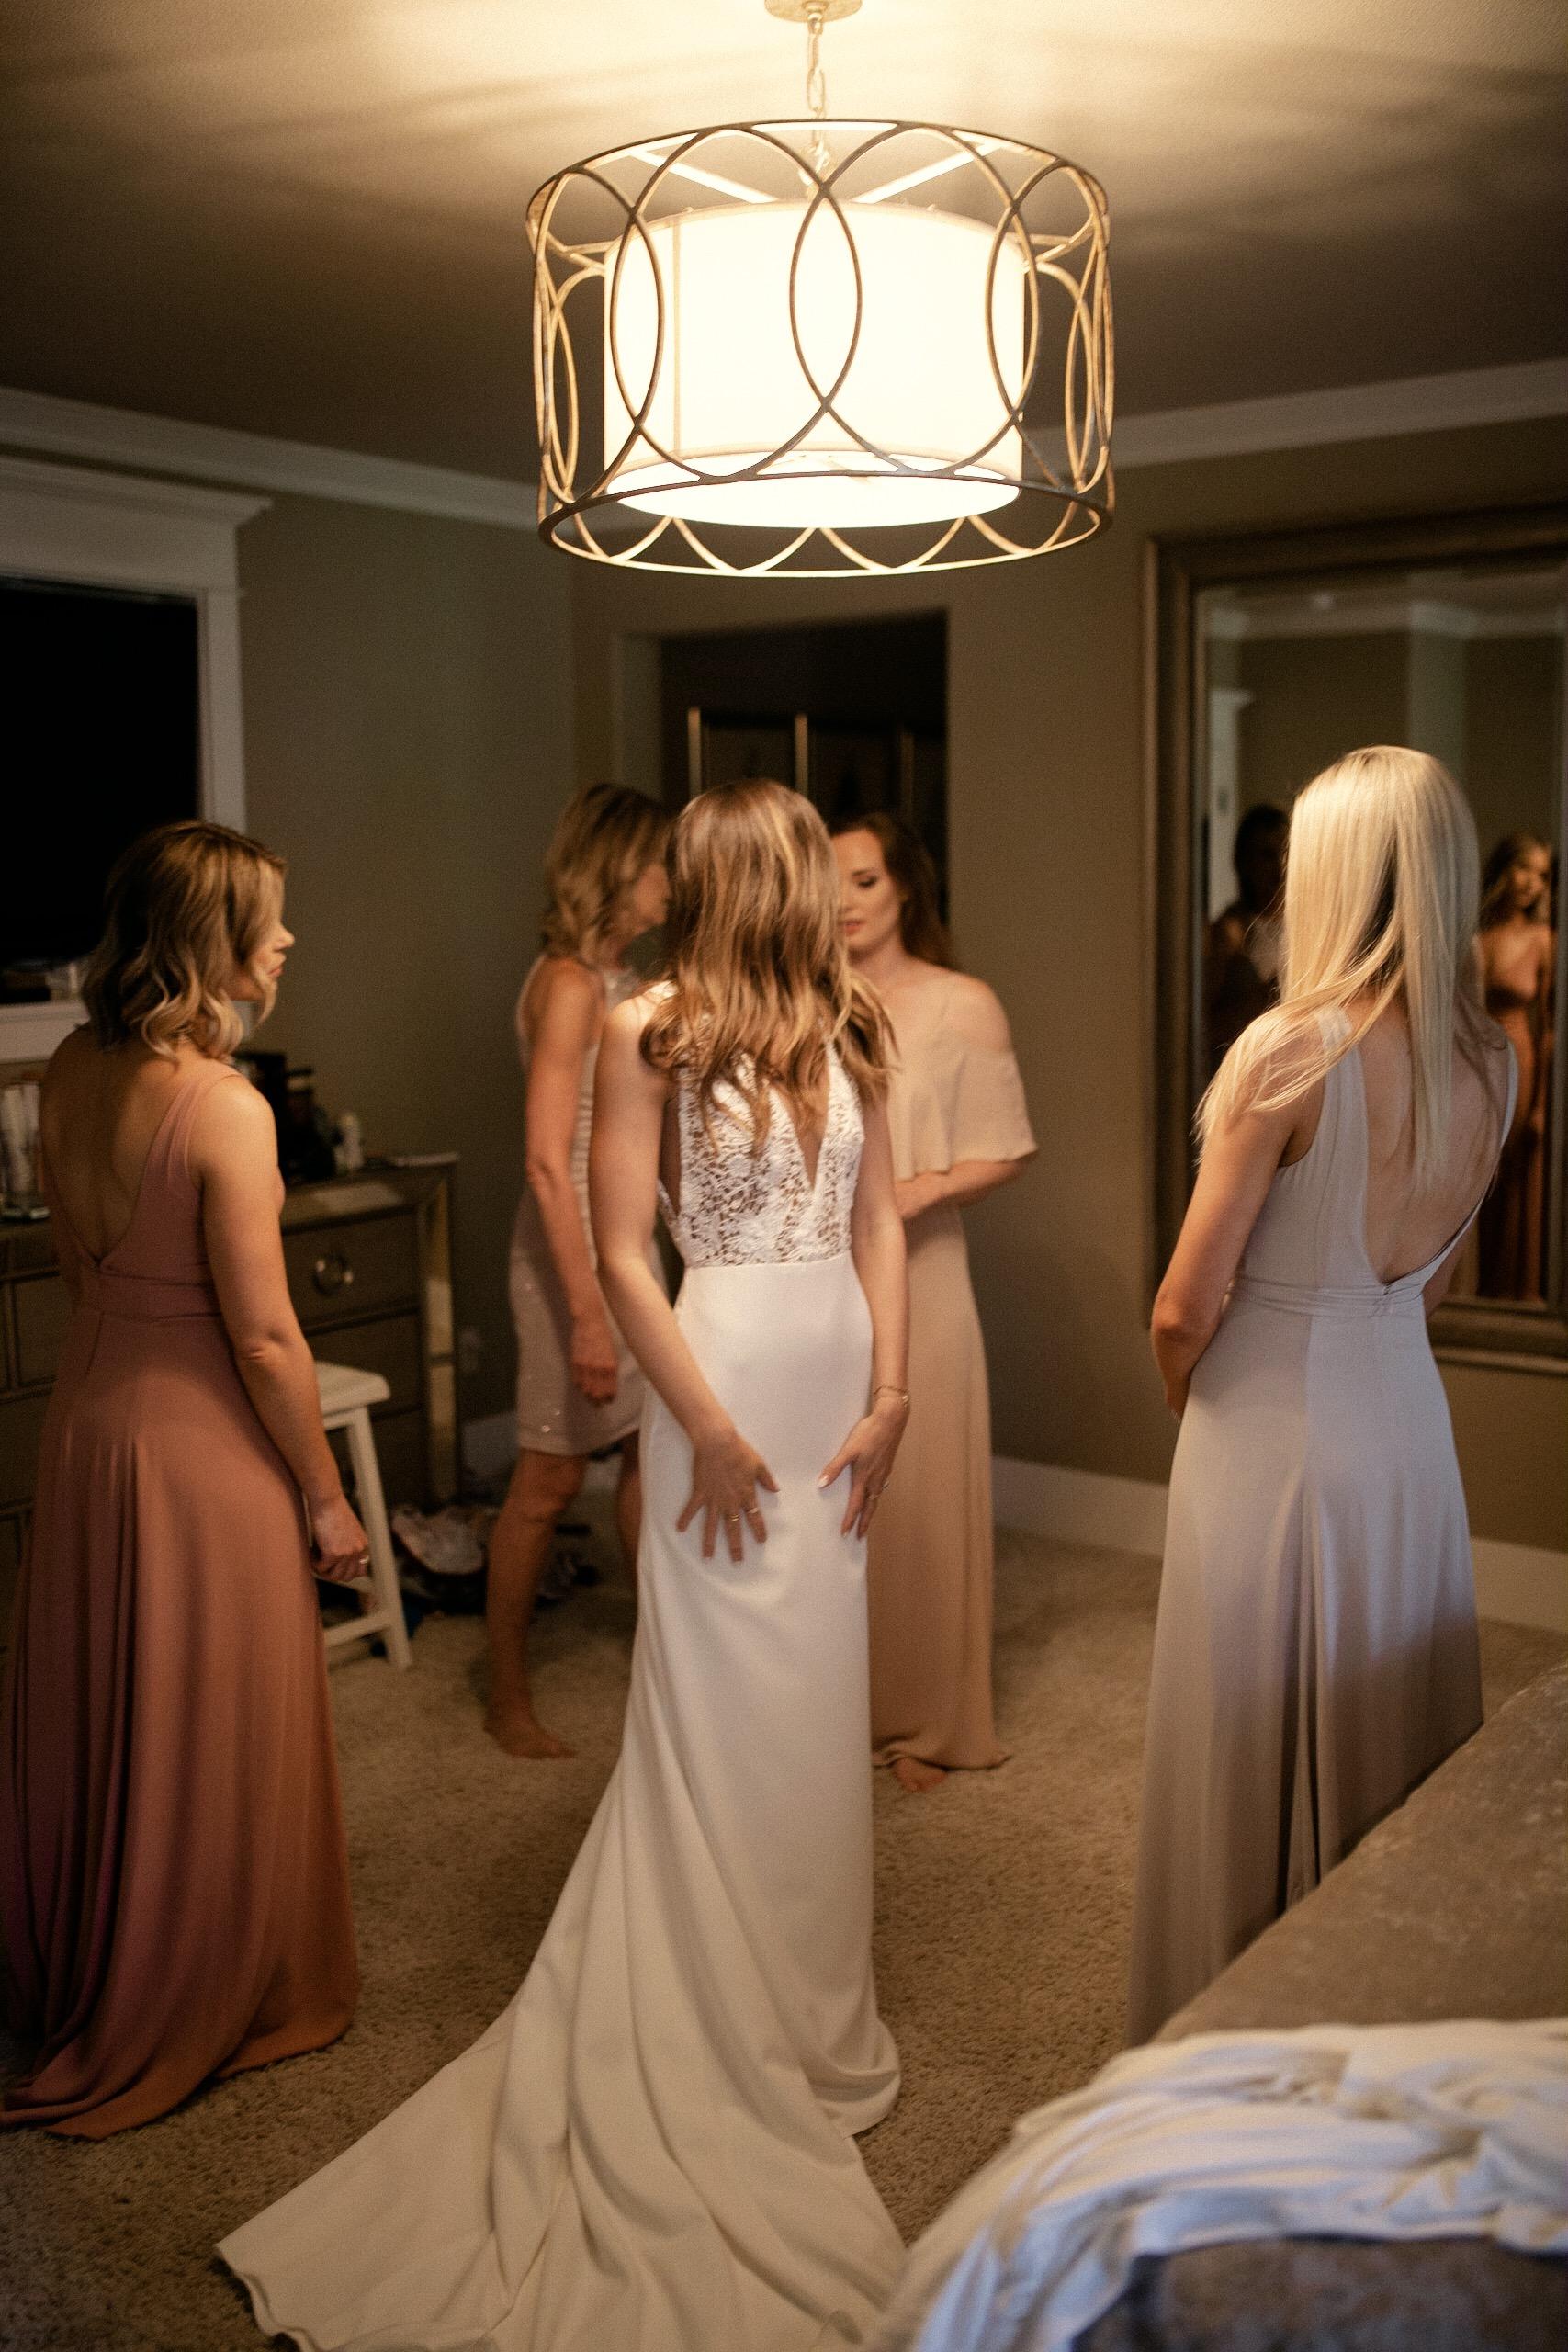 Bride and sisters' dress shot in mirror Sarah Seven wedding dress